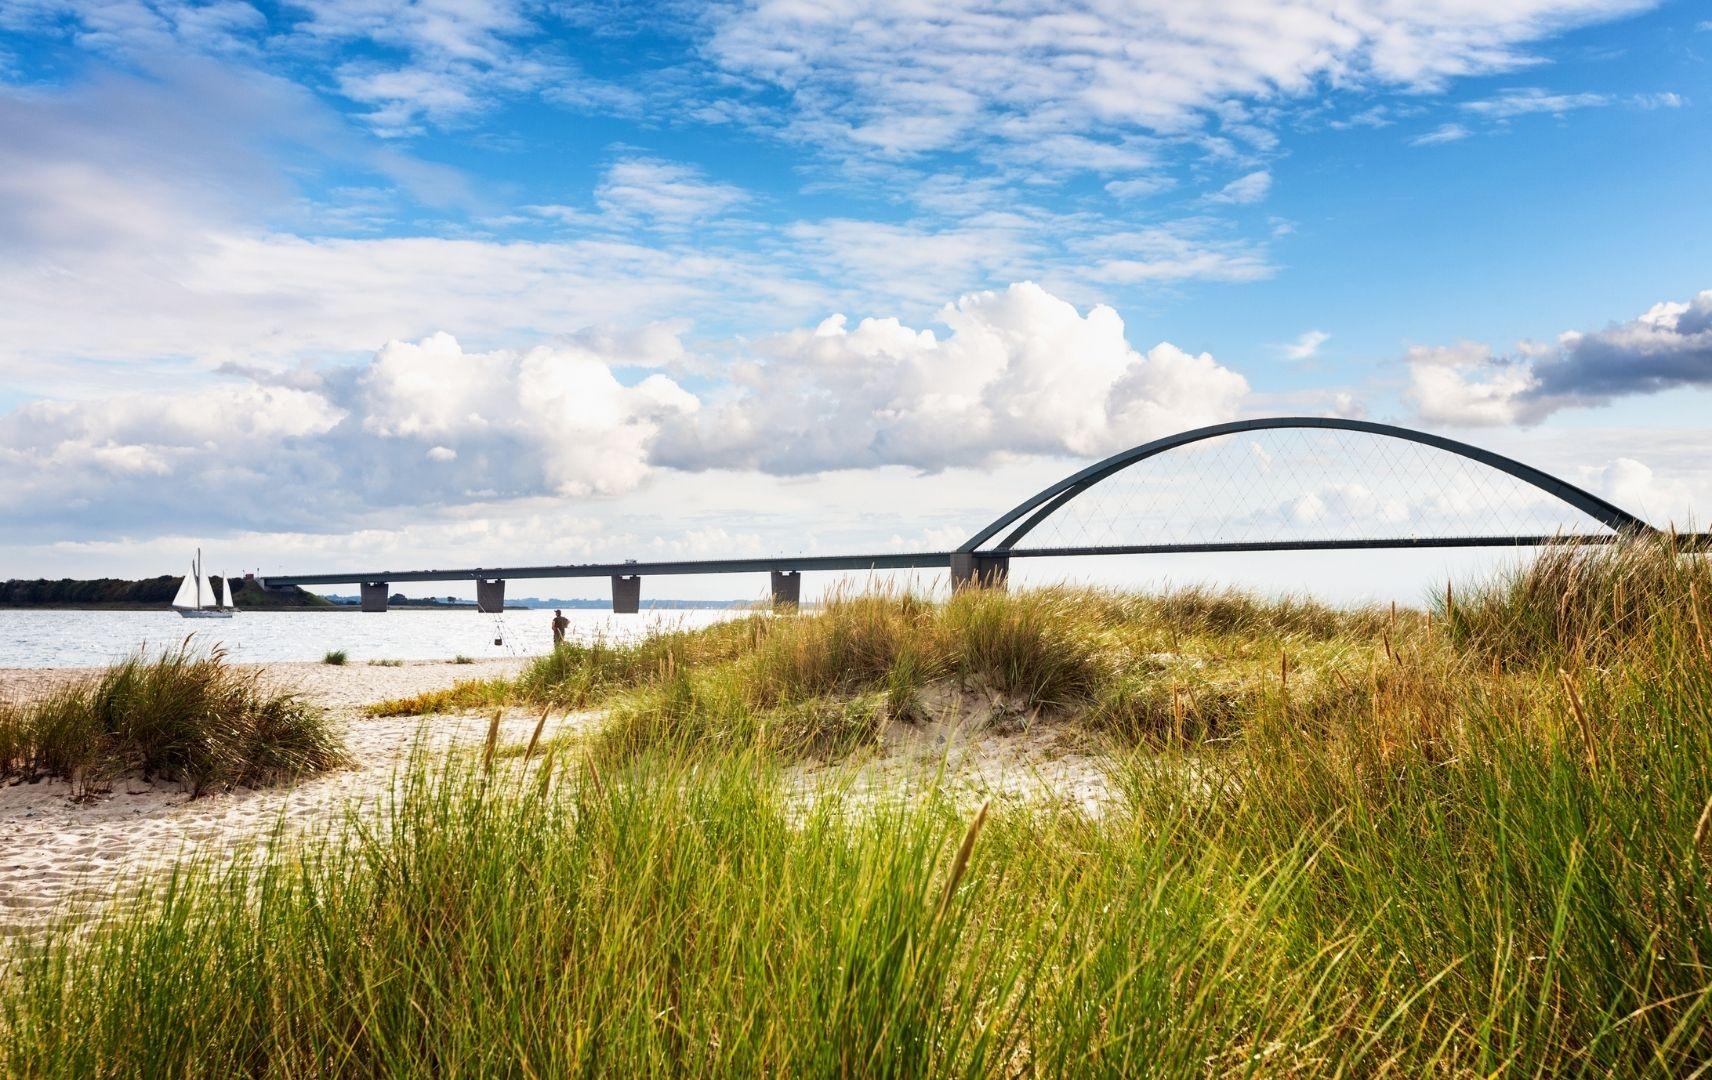 Brücke zum Festland Inselbrücke